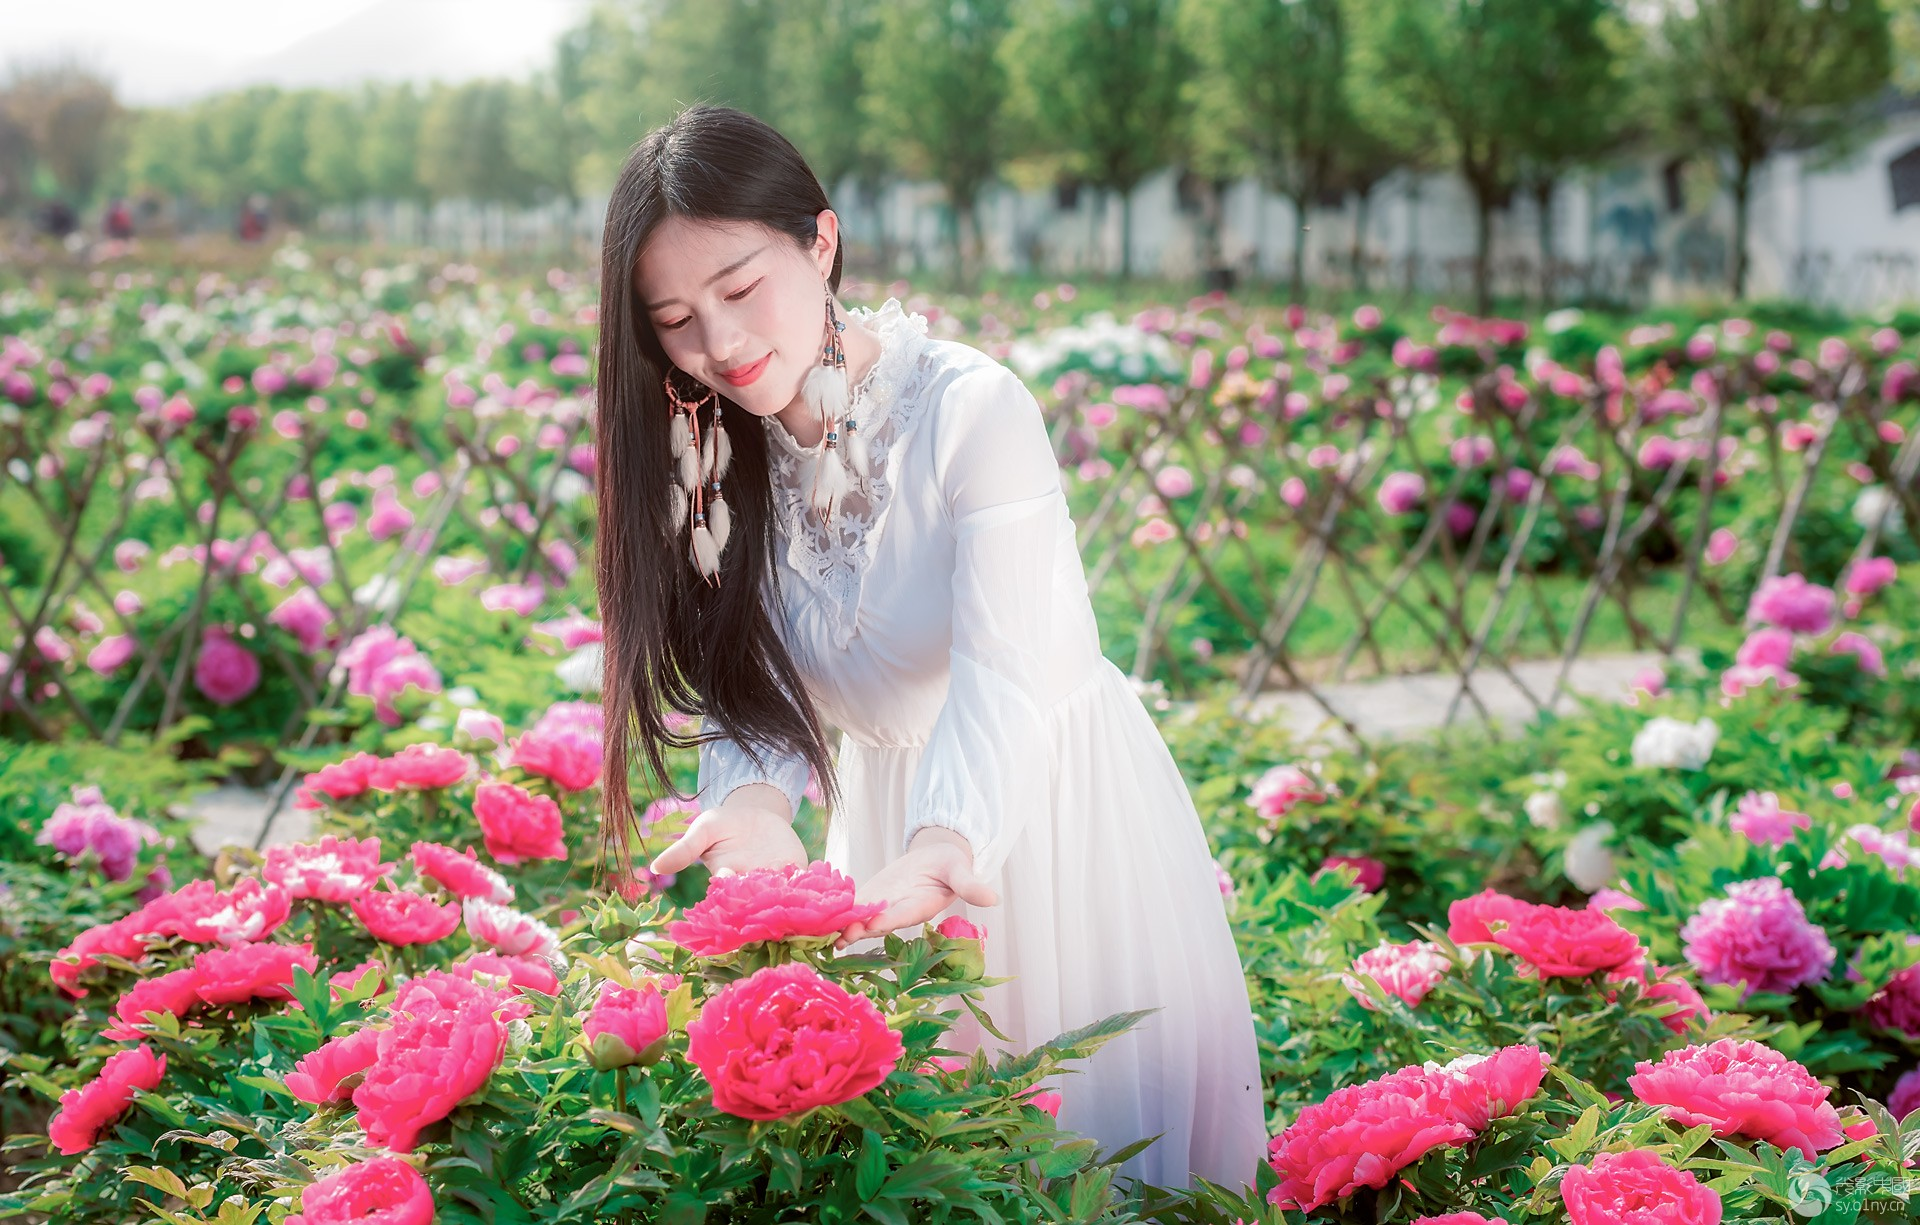 20200408_laodao_0131-编辑-编辑.jpg